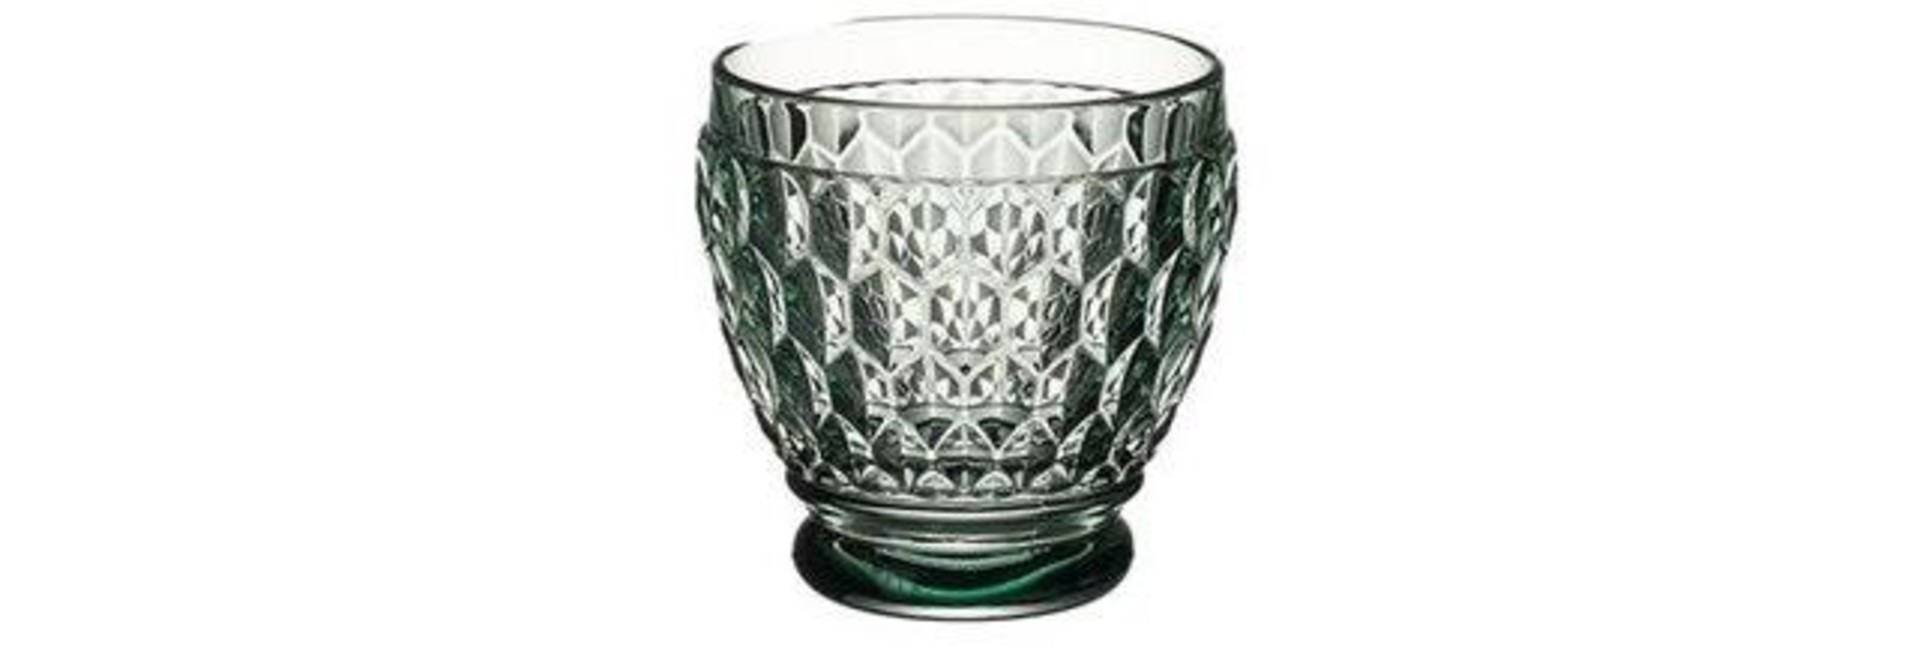 VILLEROY & BOCH - Boston Shot Glass Green